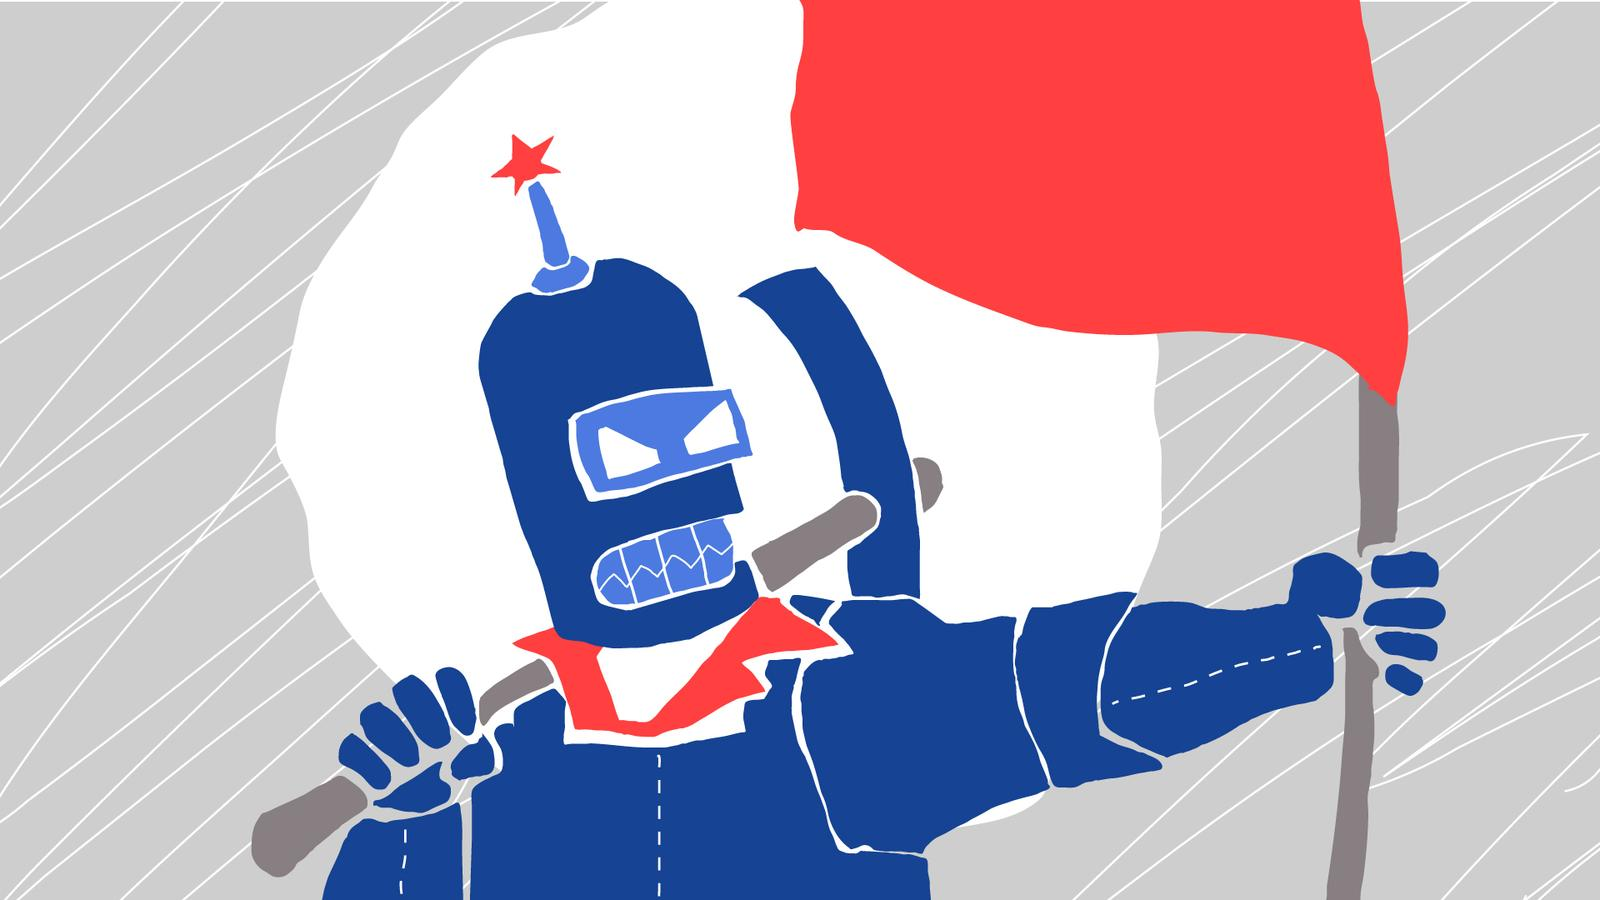 digitaler-kapitalismus-bender-neu